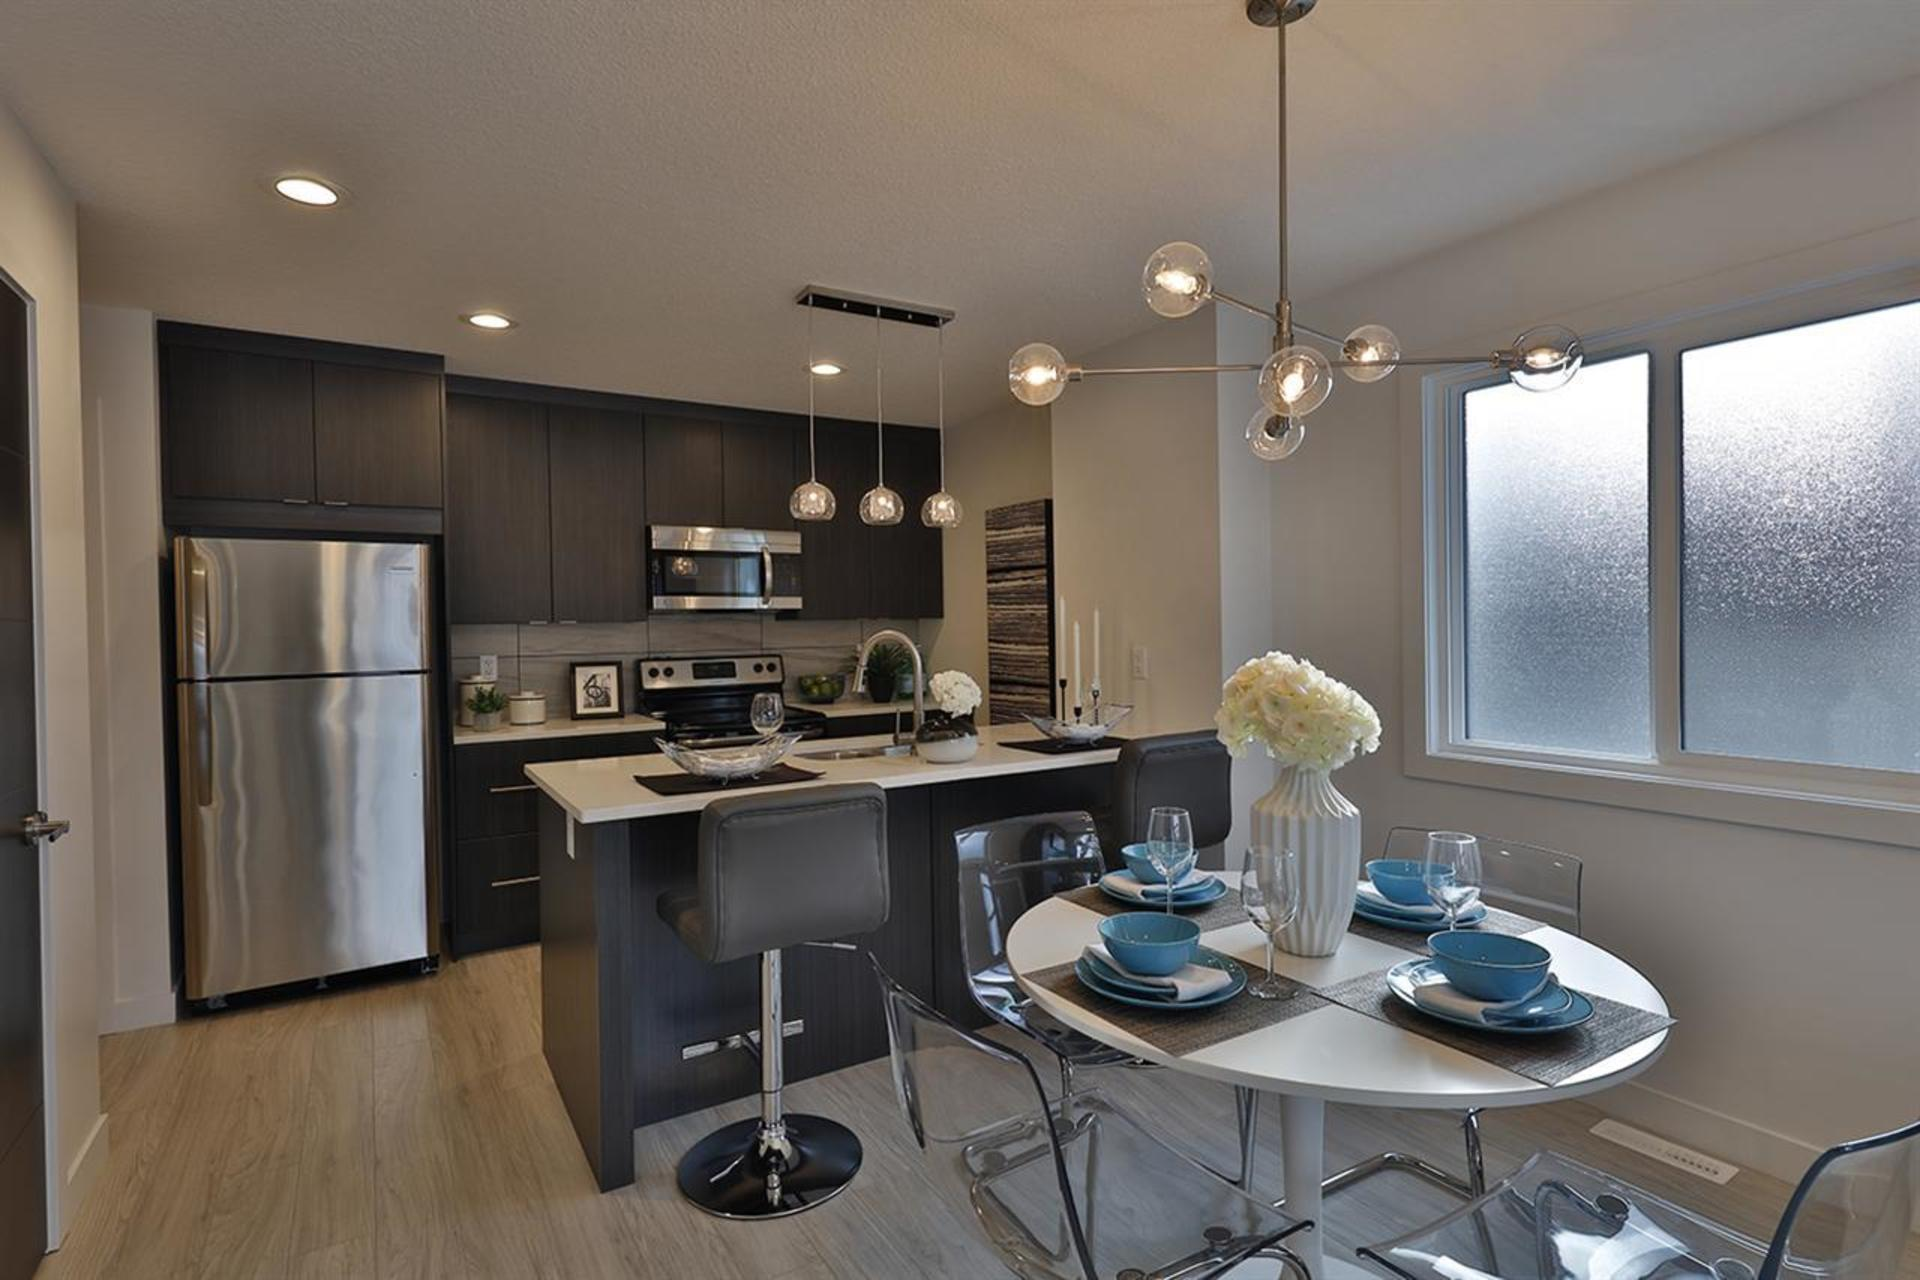 12037-93-street-alberta-avenue-edmonton-04 at 12037 93 Street, Alberta Avenue, Edmonton